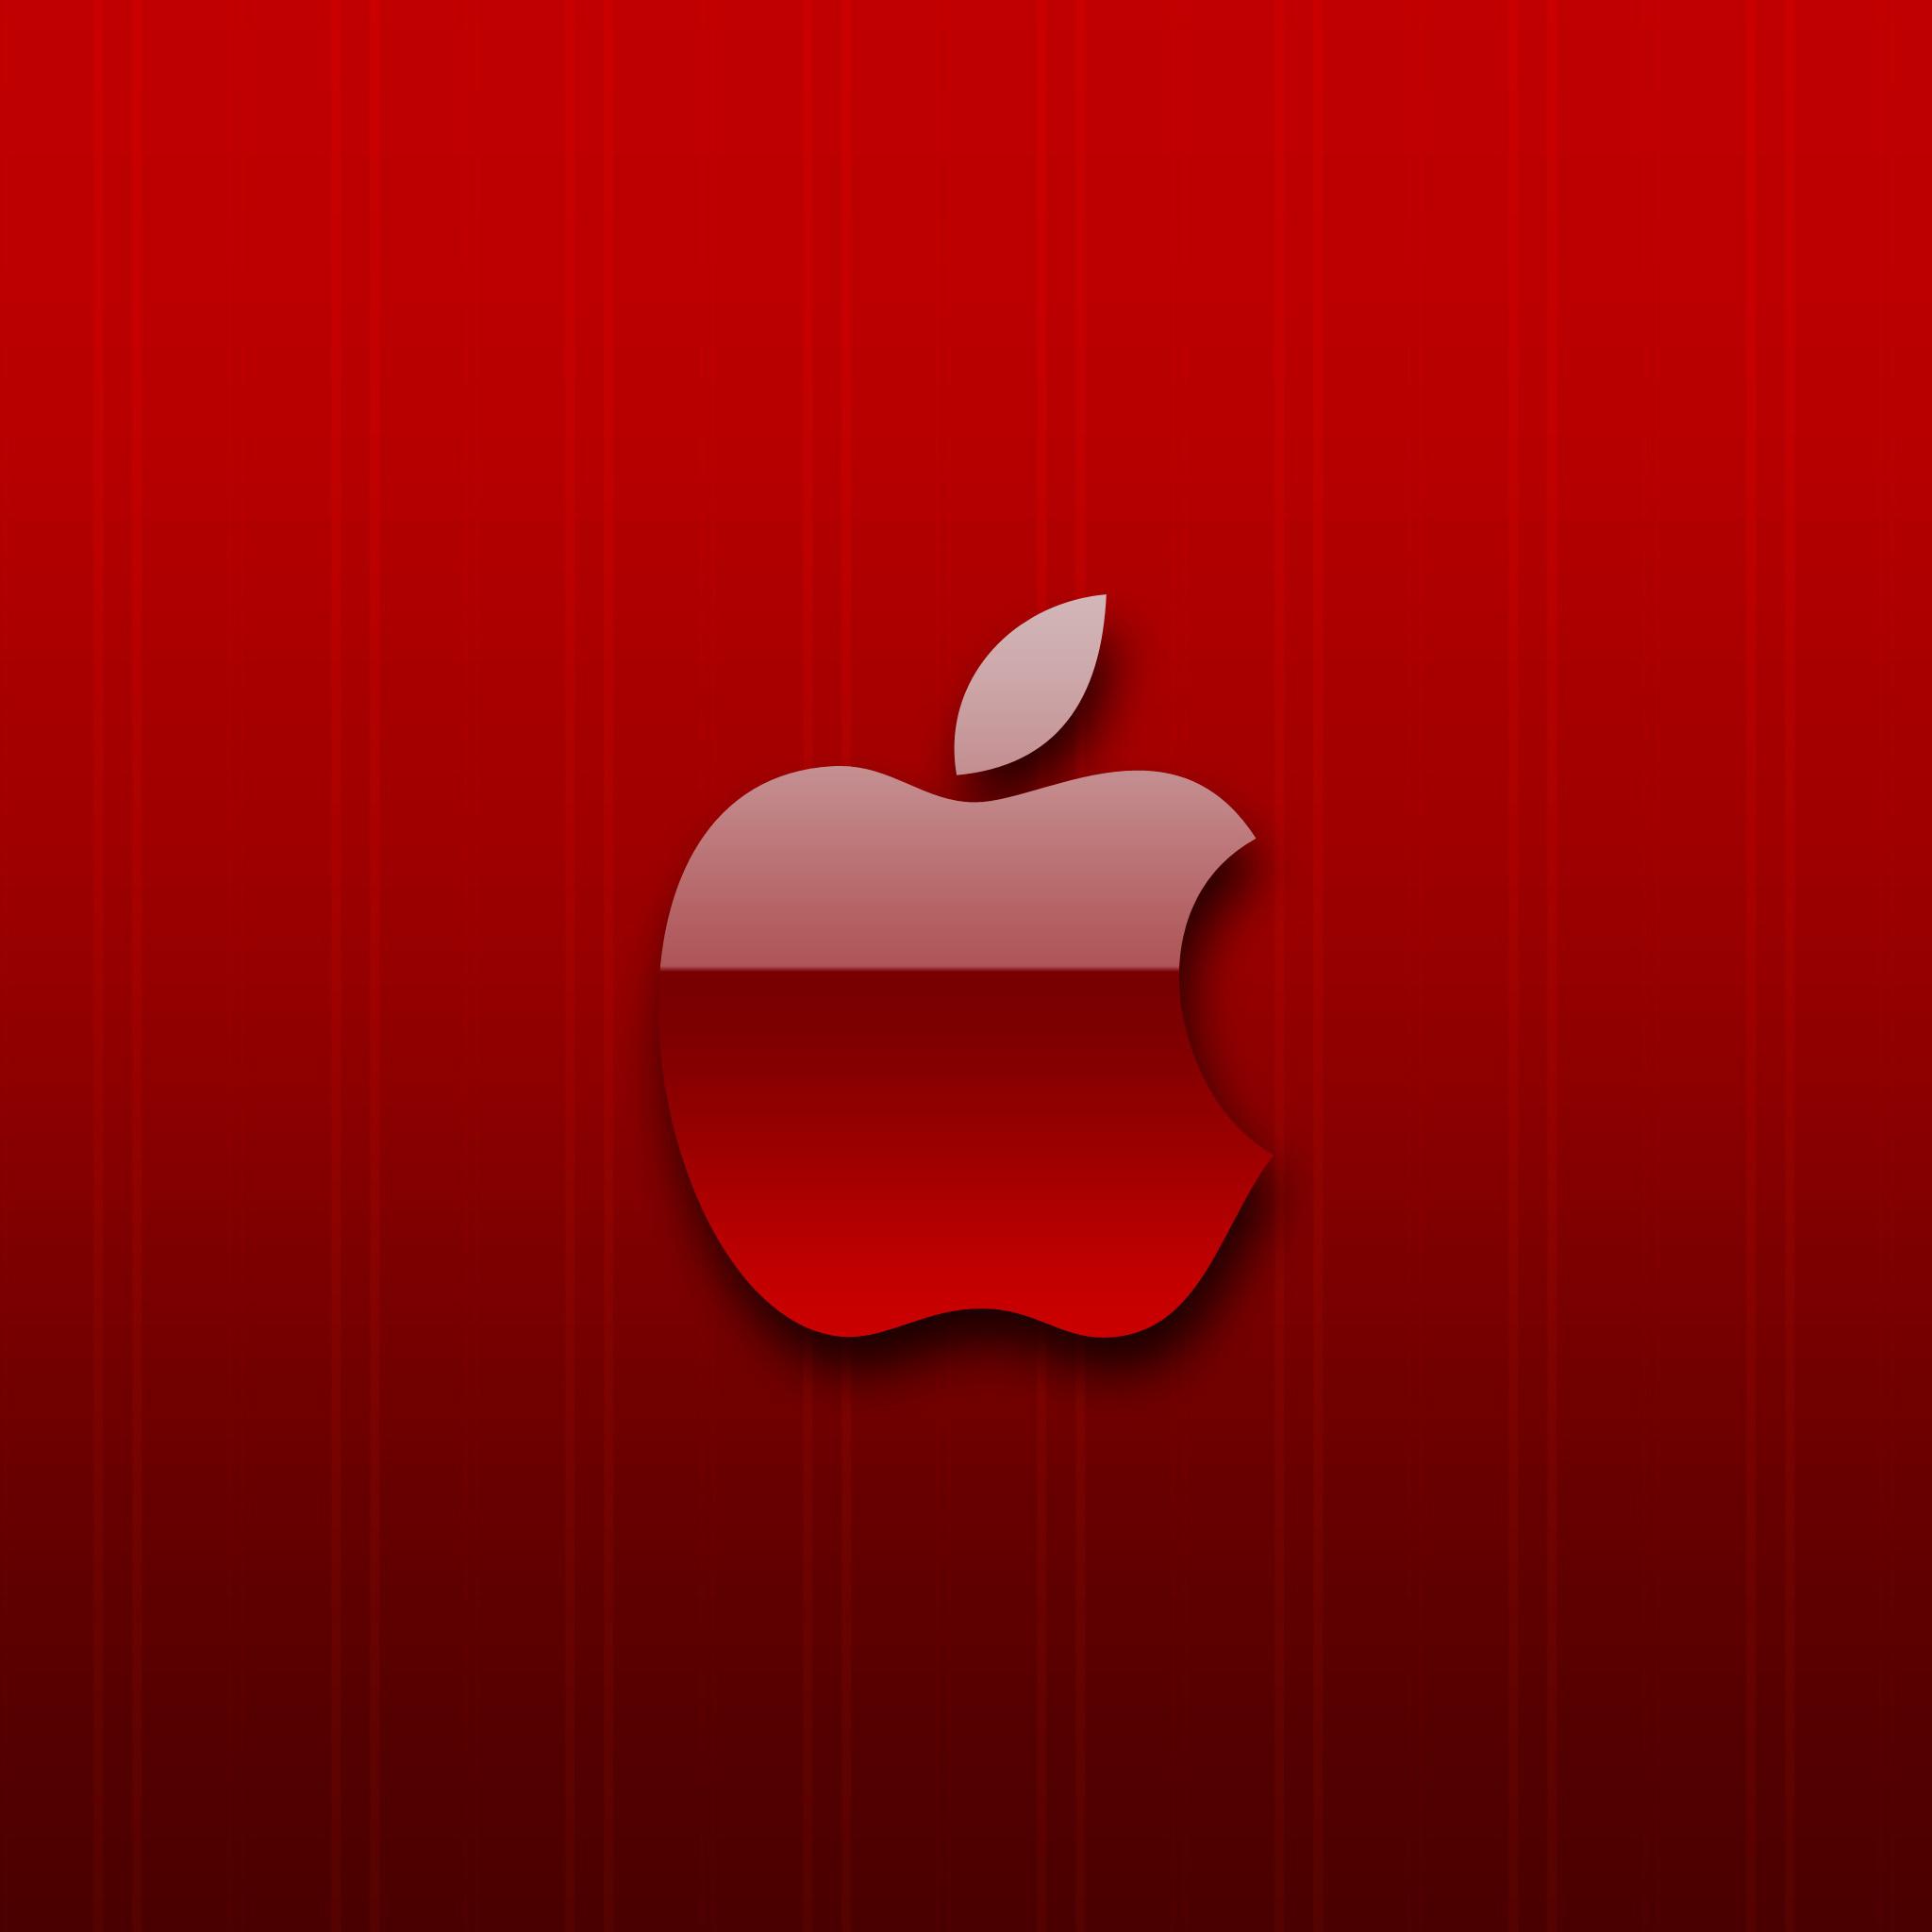 Red Apple 3Wallpapers iPad Retina Red Apple   iPad Retina